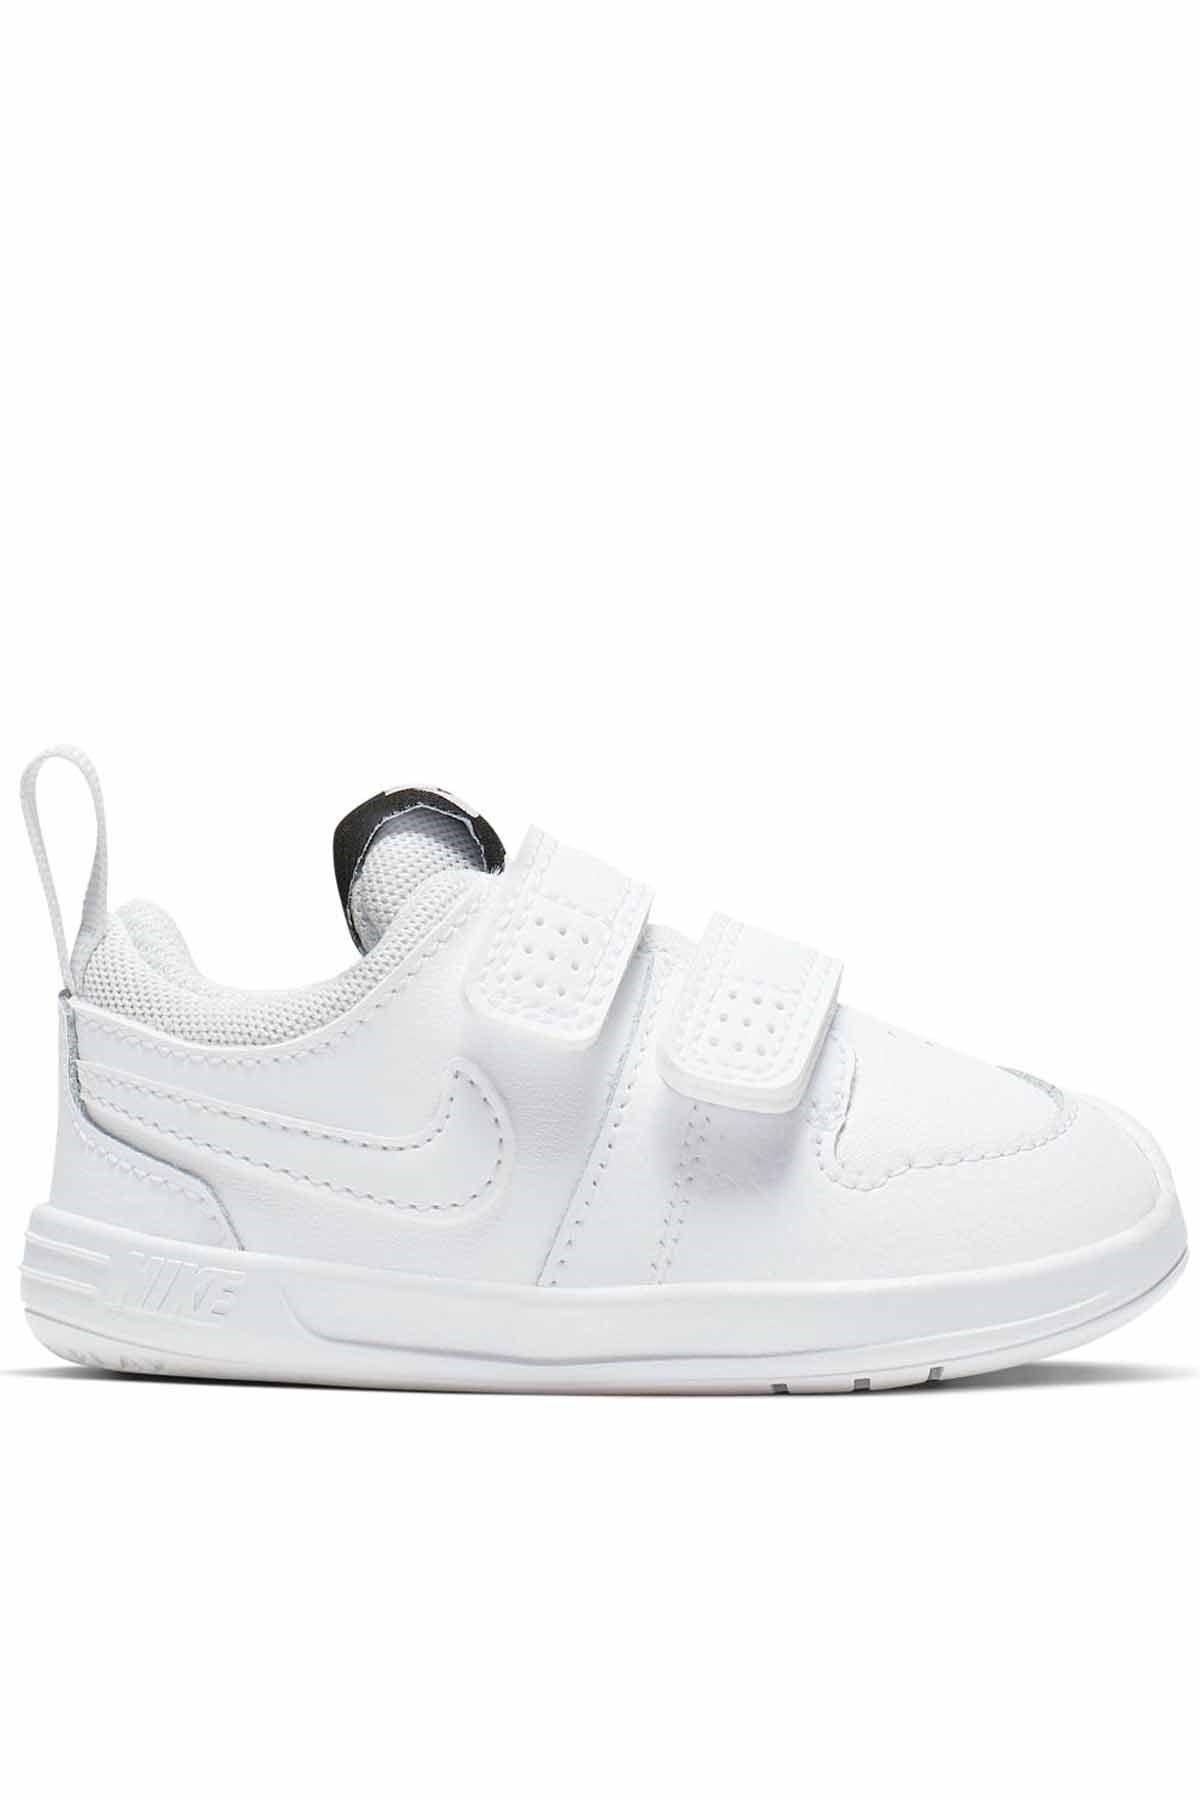 Nike Kids Pico 5 Çocuk Ayakkabısı 1